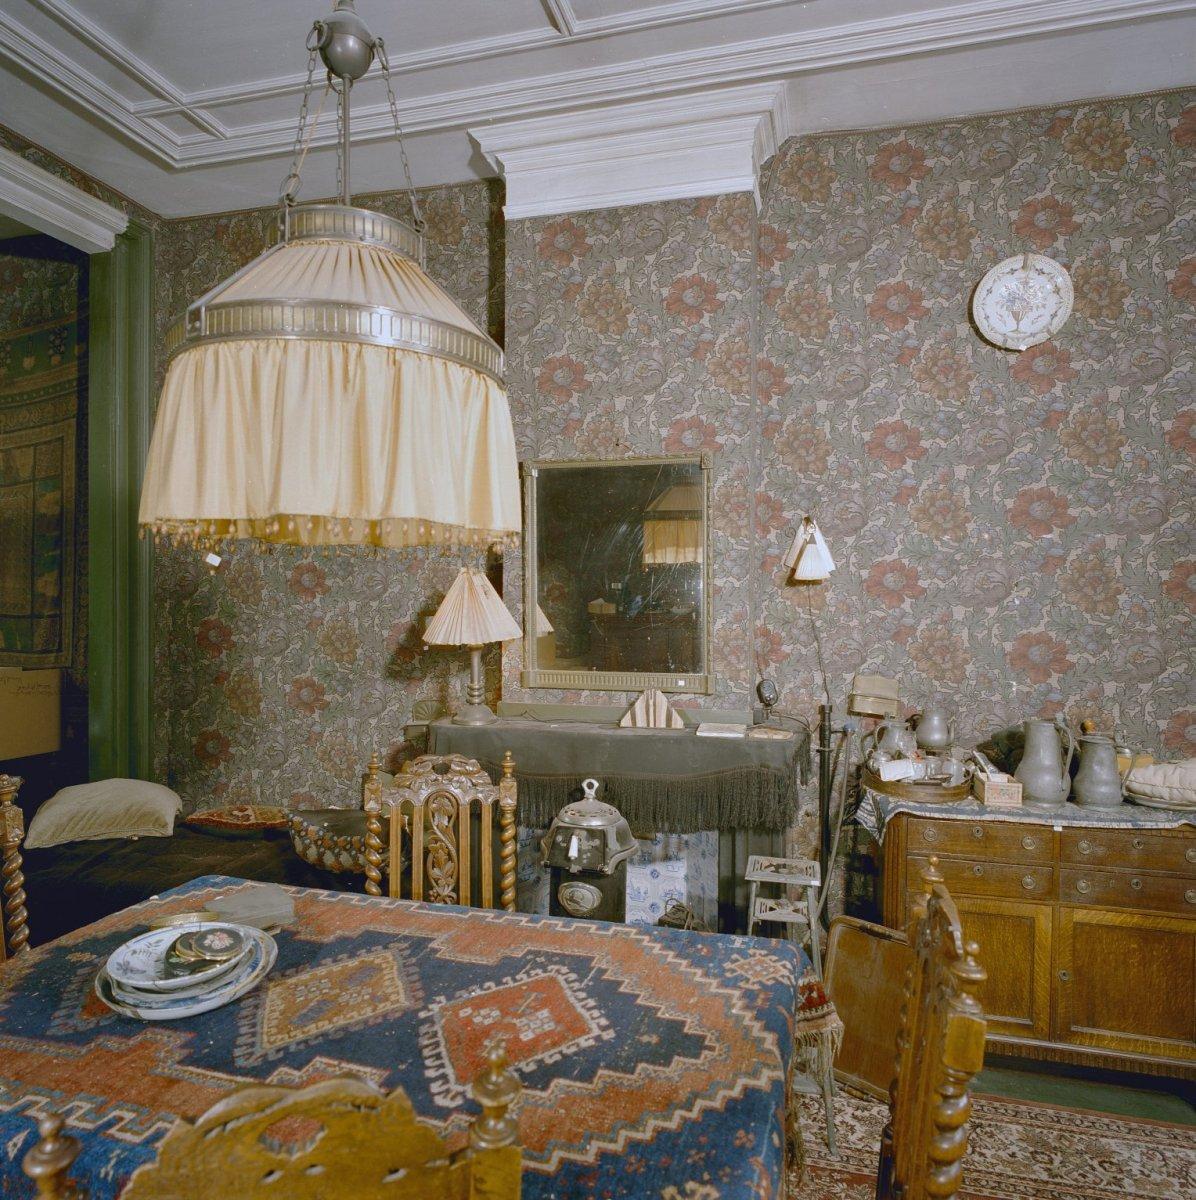 File interieur woonkamer met behangsel laat 19e eeuw 39 s gravenhage 20327036 - Interieur woonkamer ...